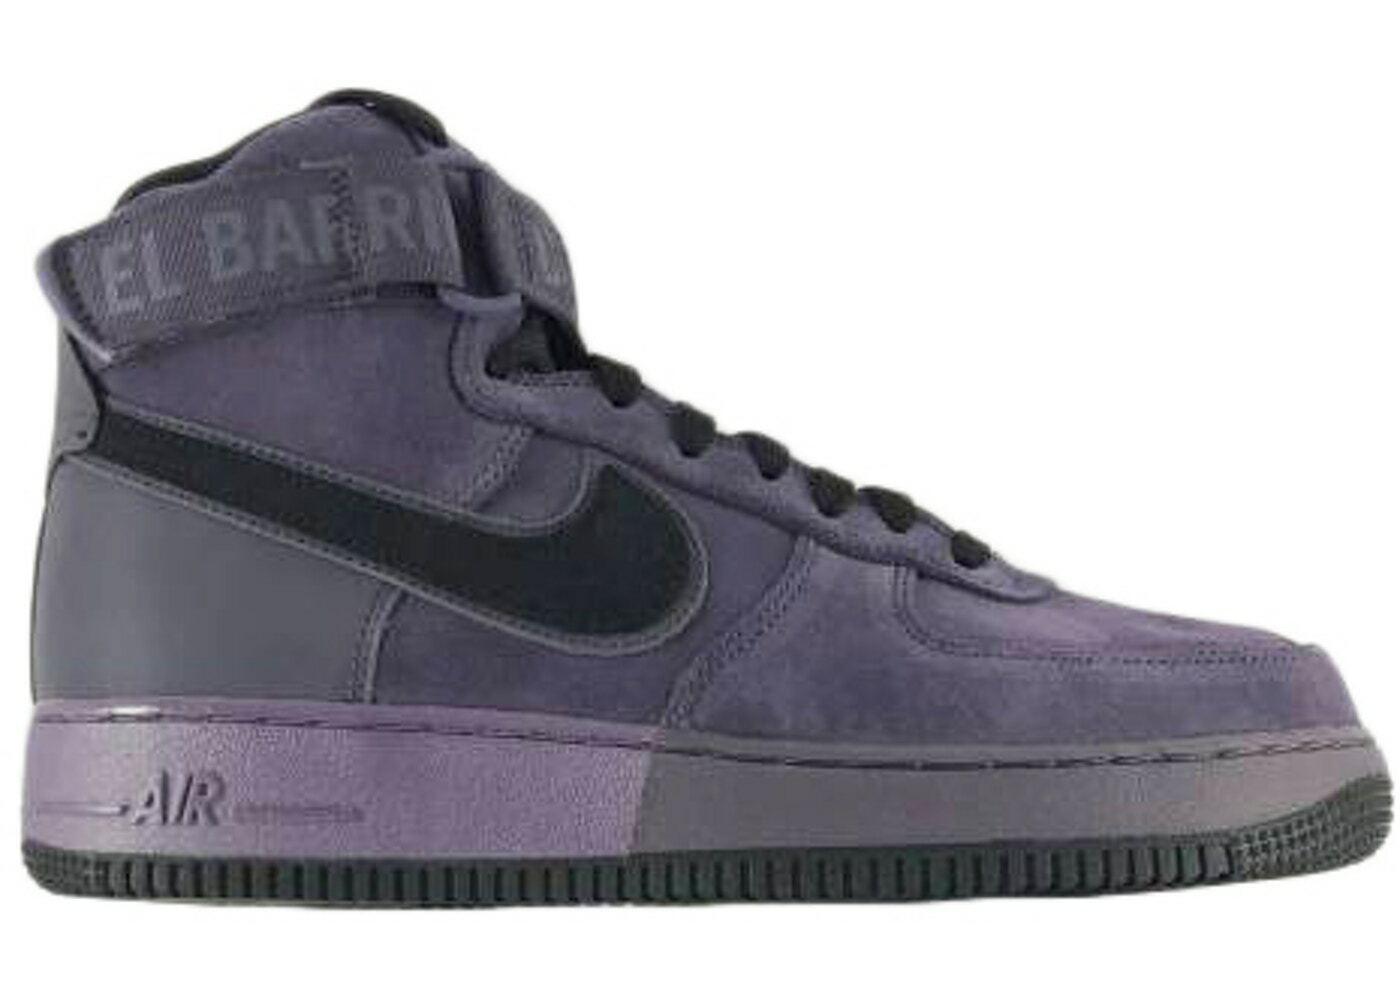 Nike Air Force 1 High '07 QS Men's Shoes 573967 500 Harlem Uptown Purple Black